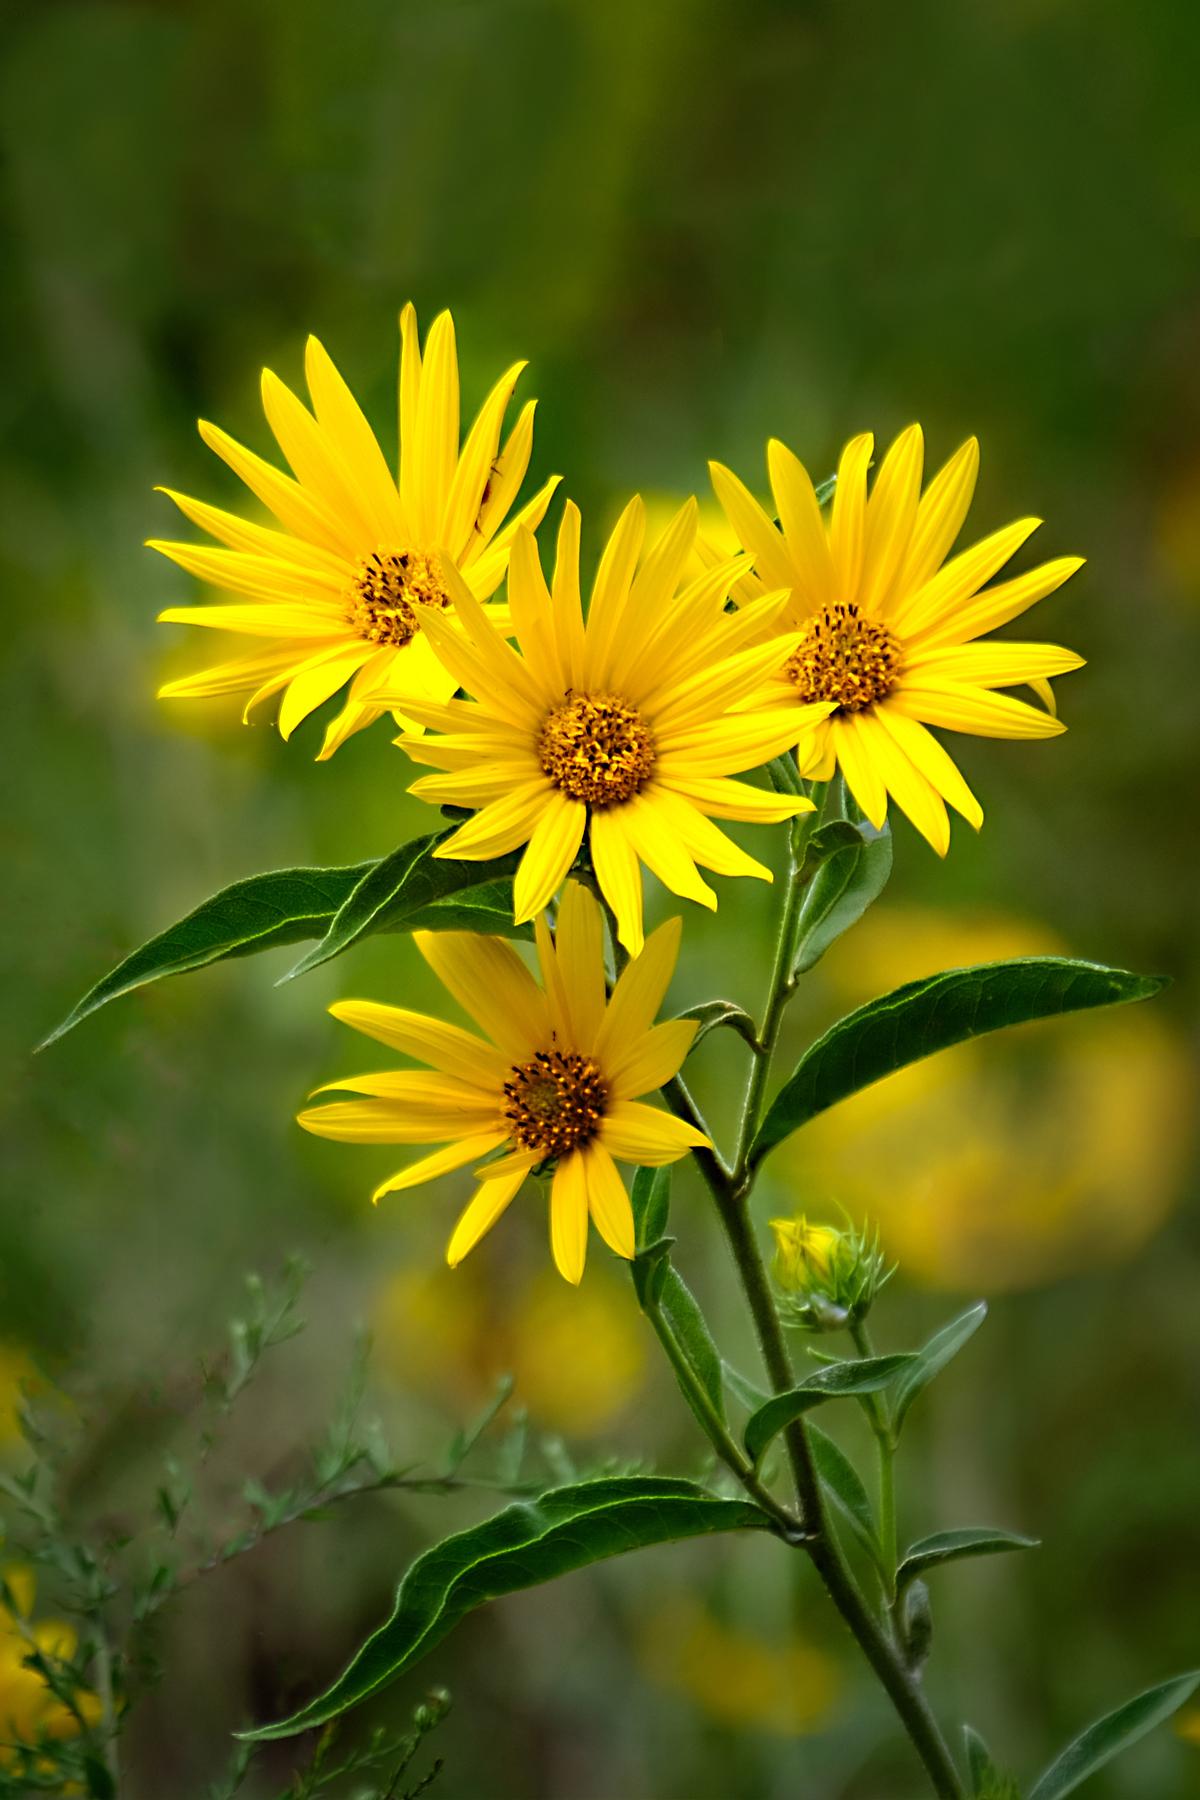 SunshineOnWildflowers - DeniseRemfert.jpg